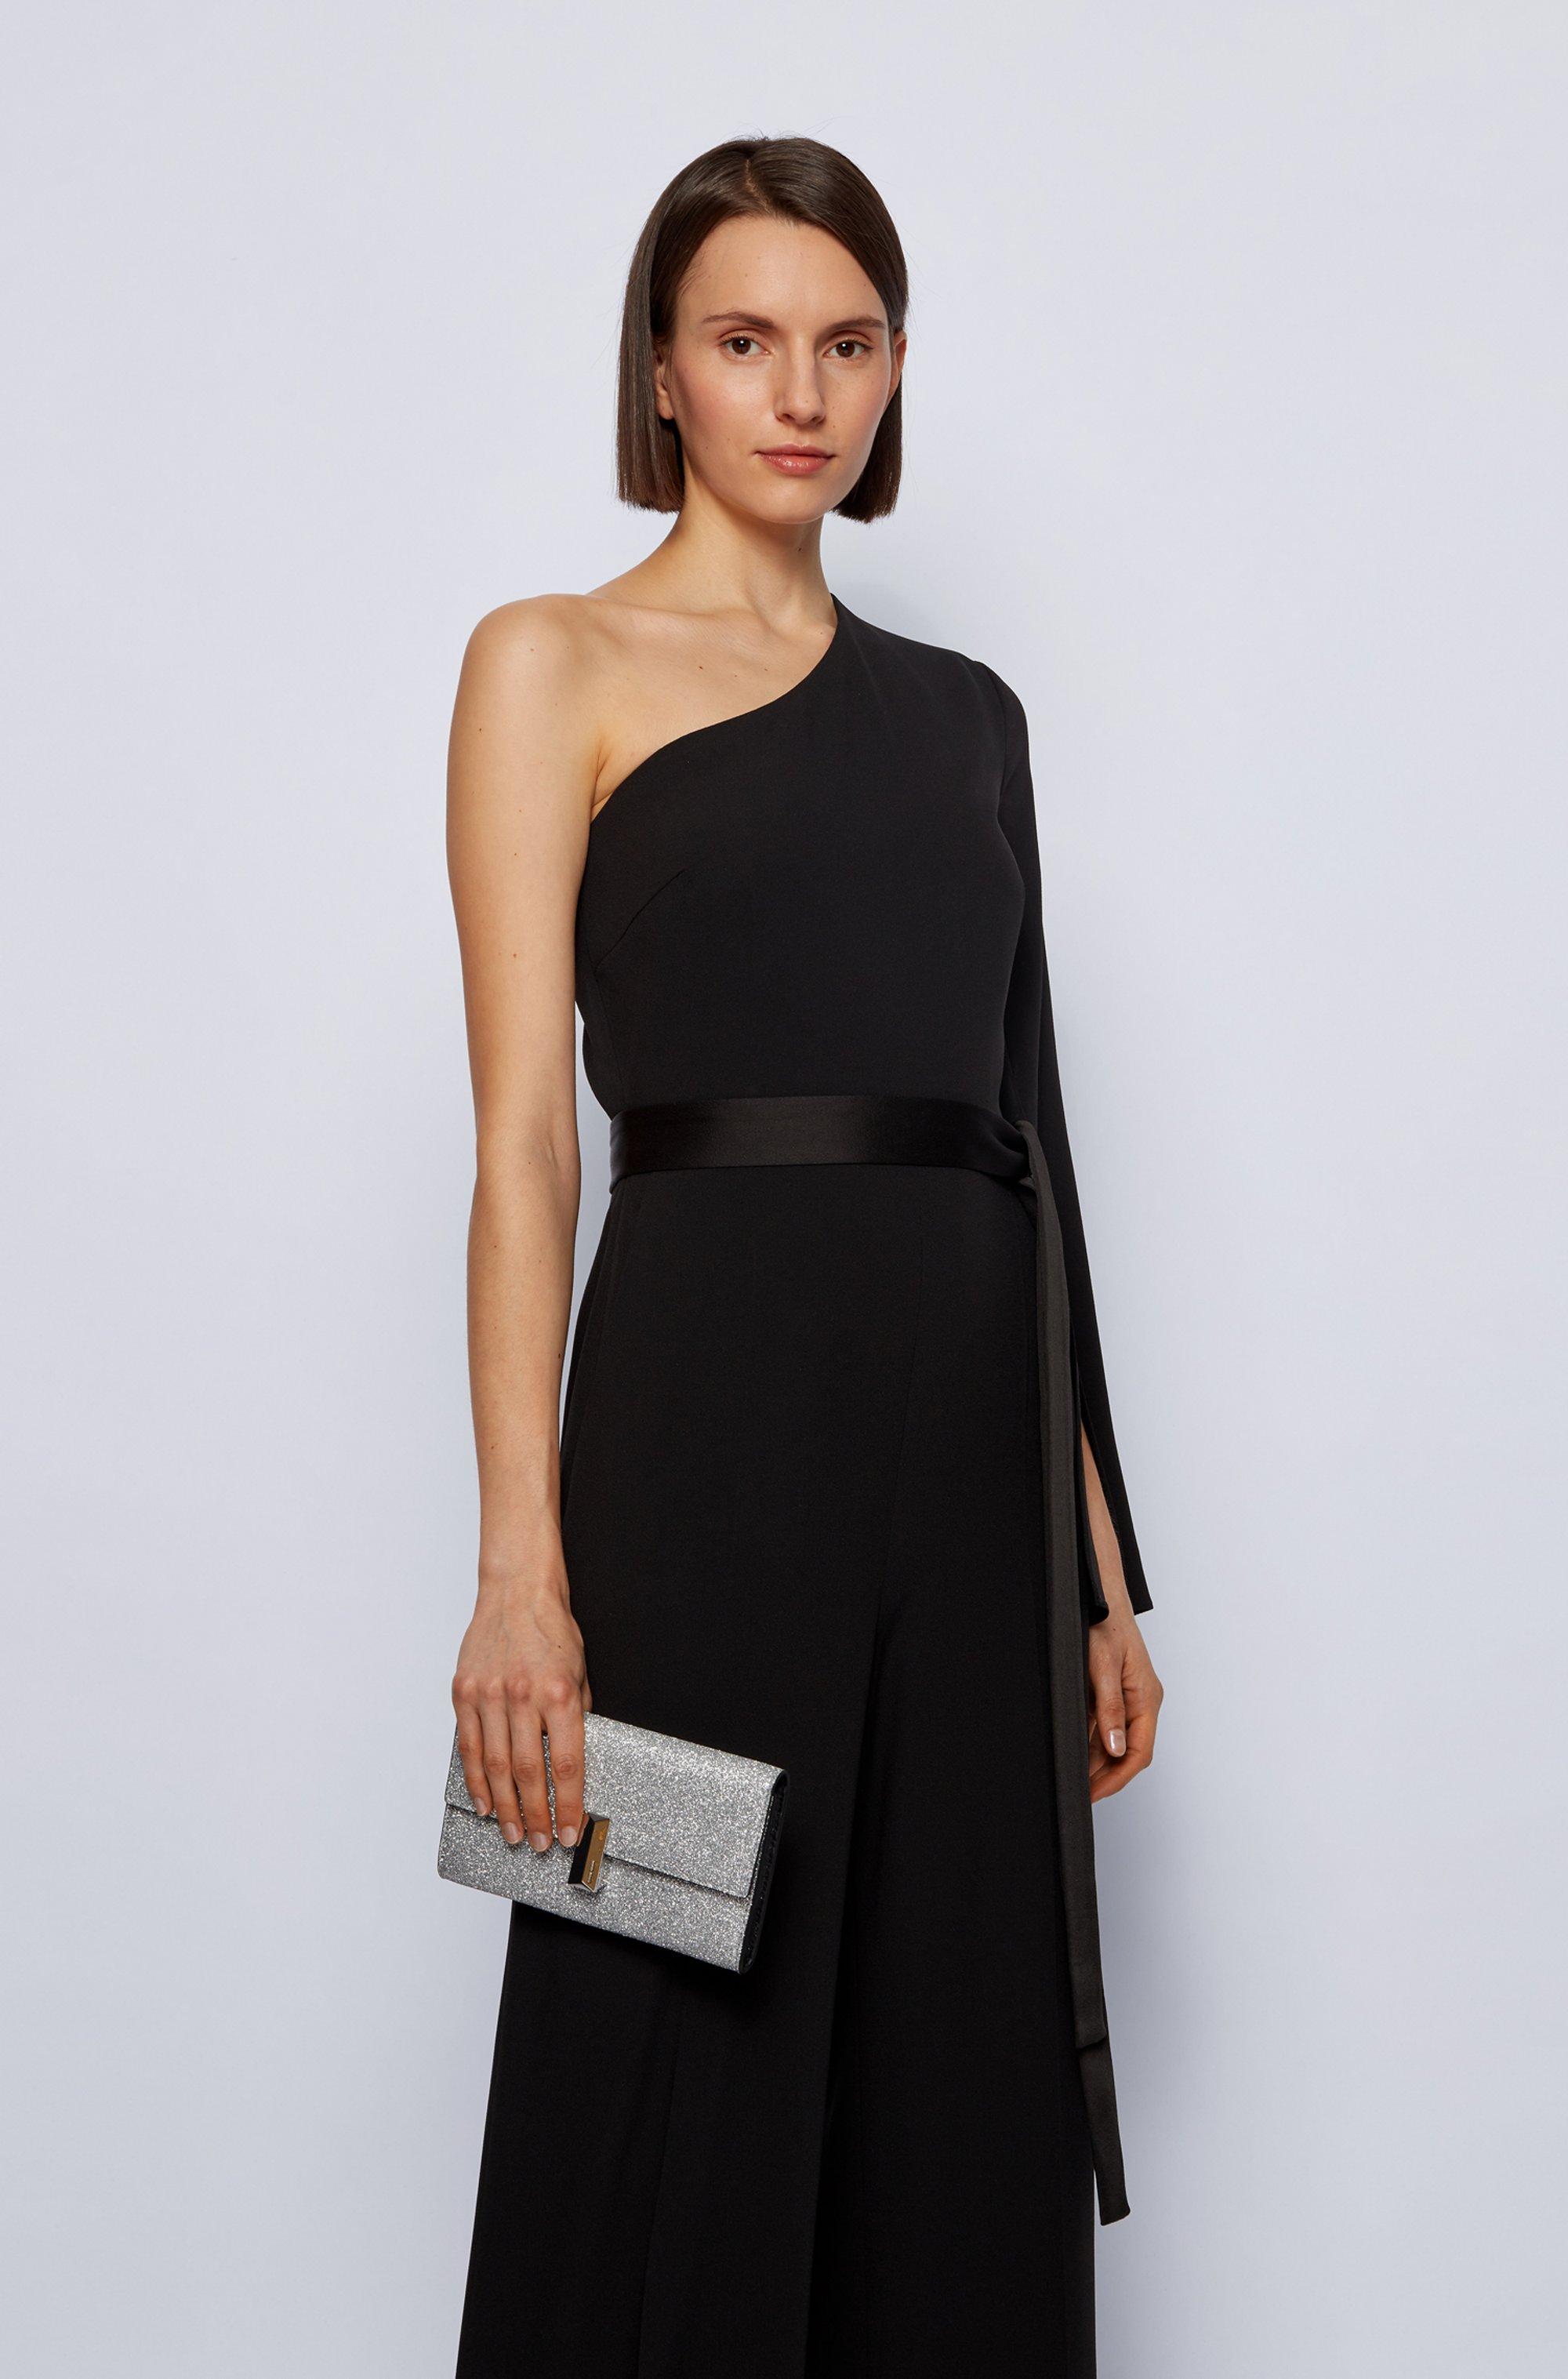 Glitter-fabric clutch bag with detachable wrist chain